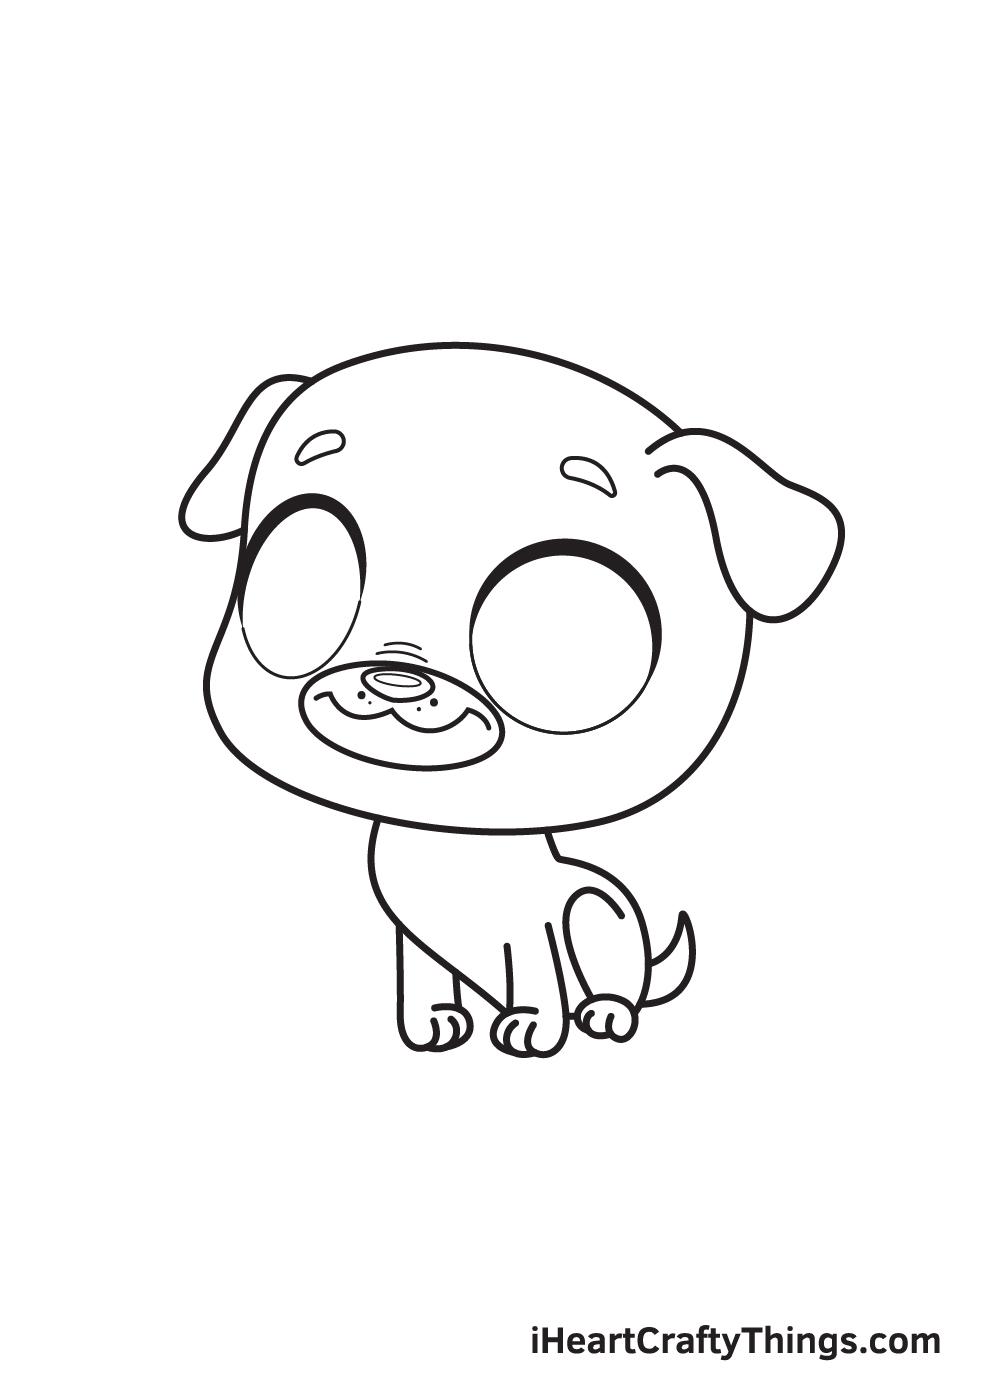 pug drawing step 8